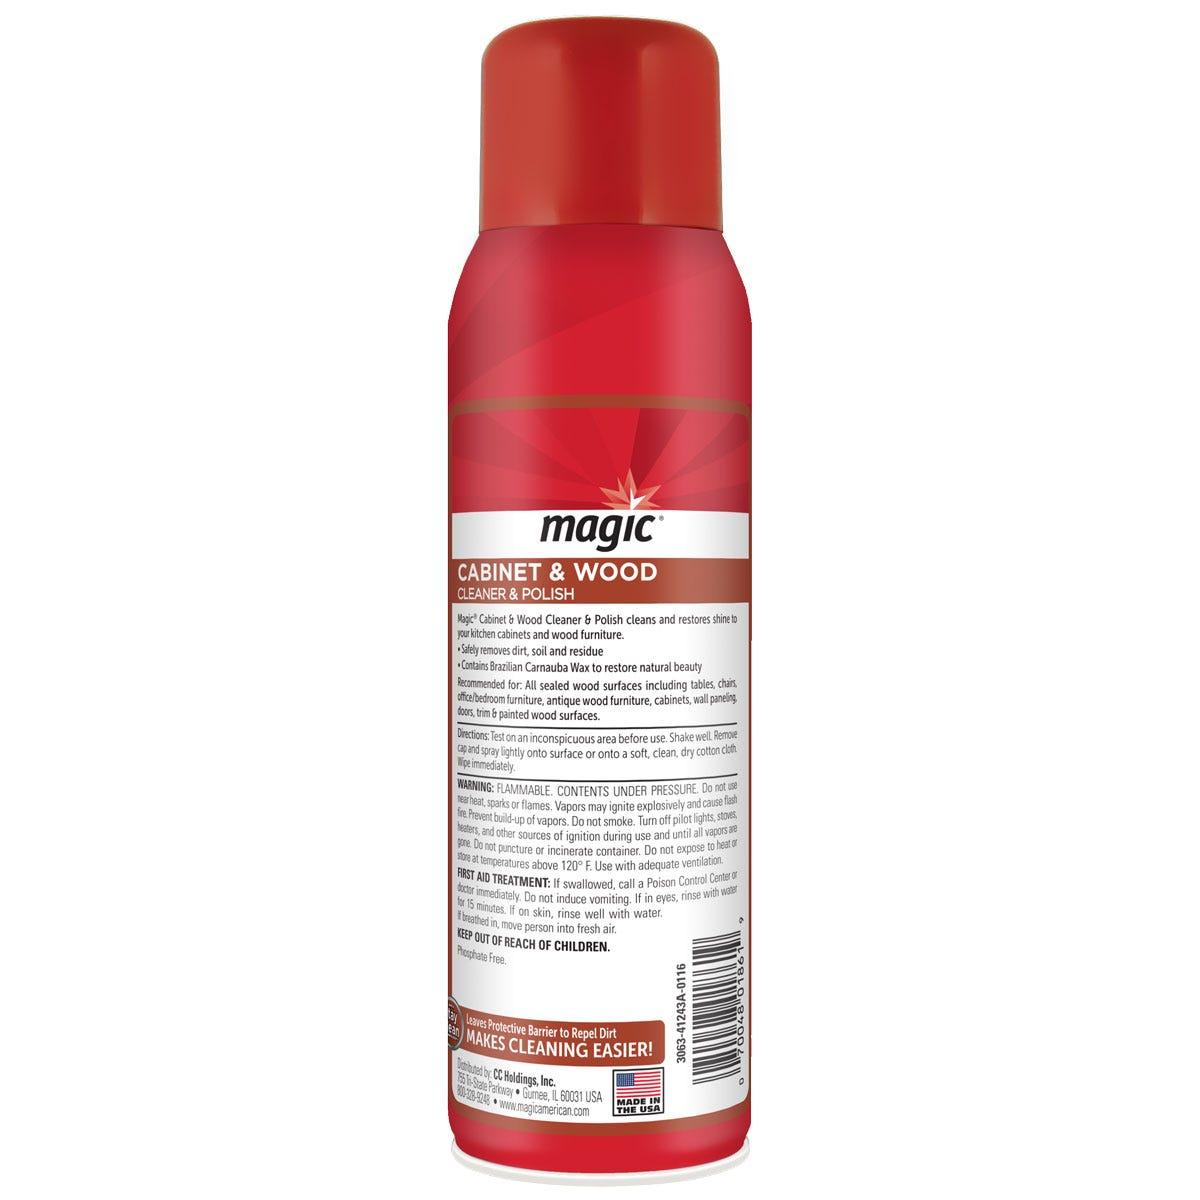 Magic Cabinet Cleaner back label